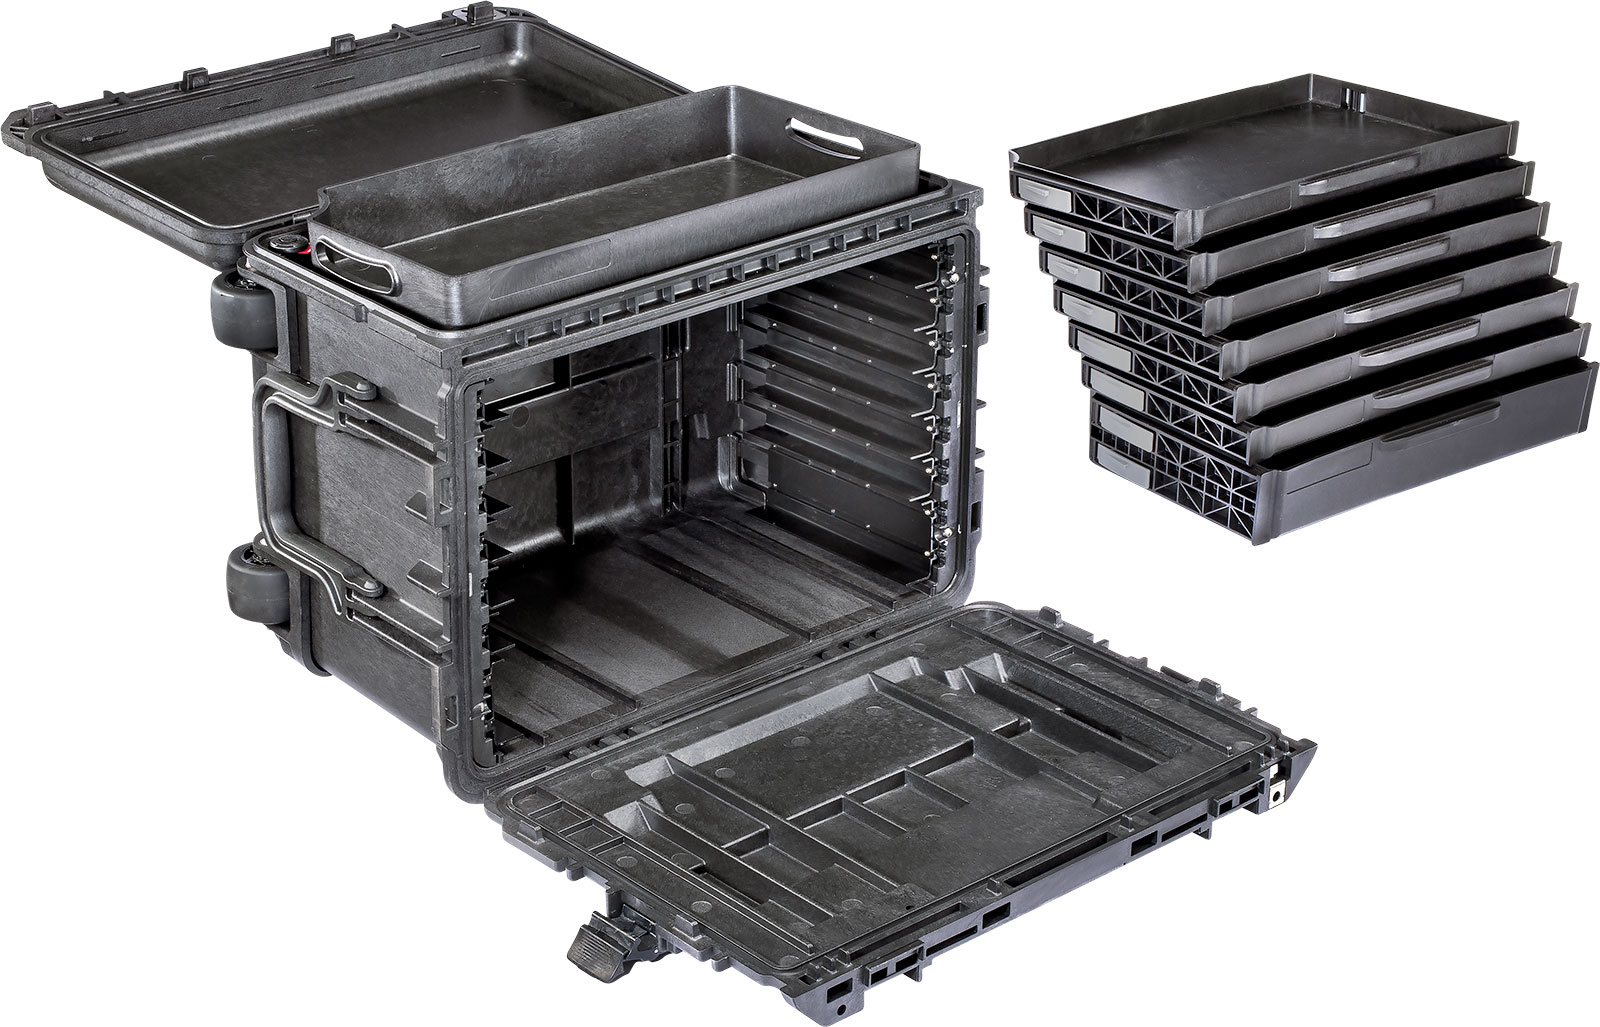 pelican 0450 gen 2 tool box sd6 drawers